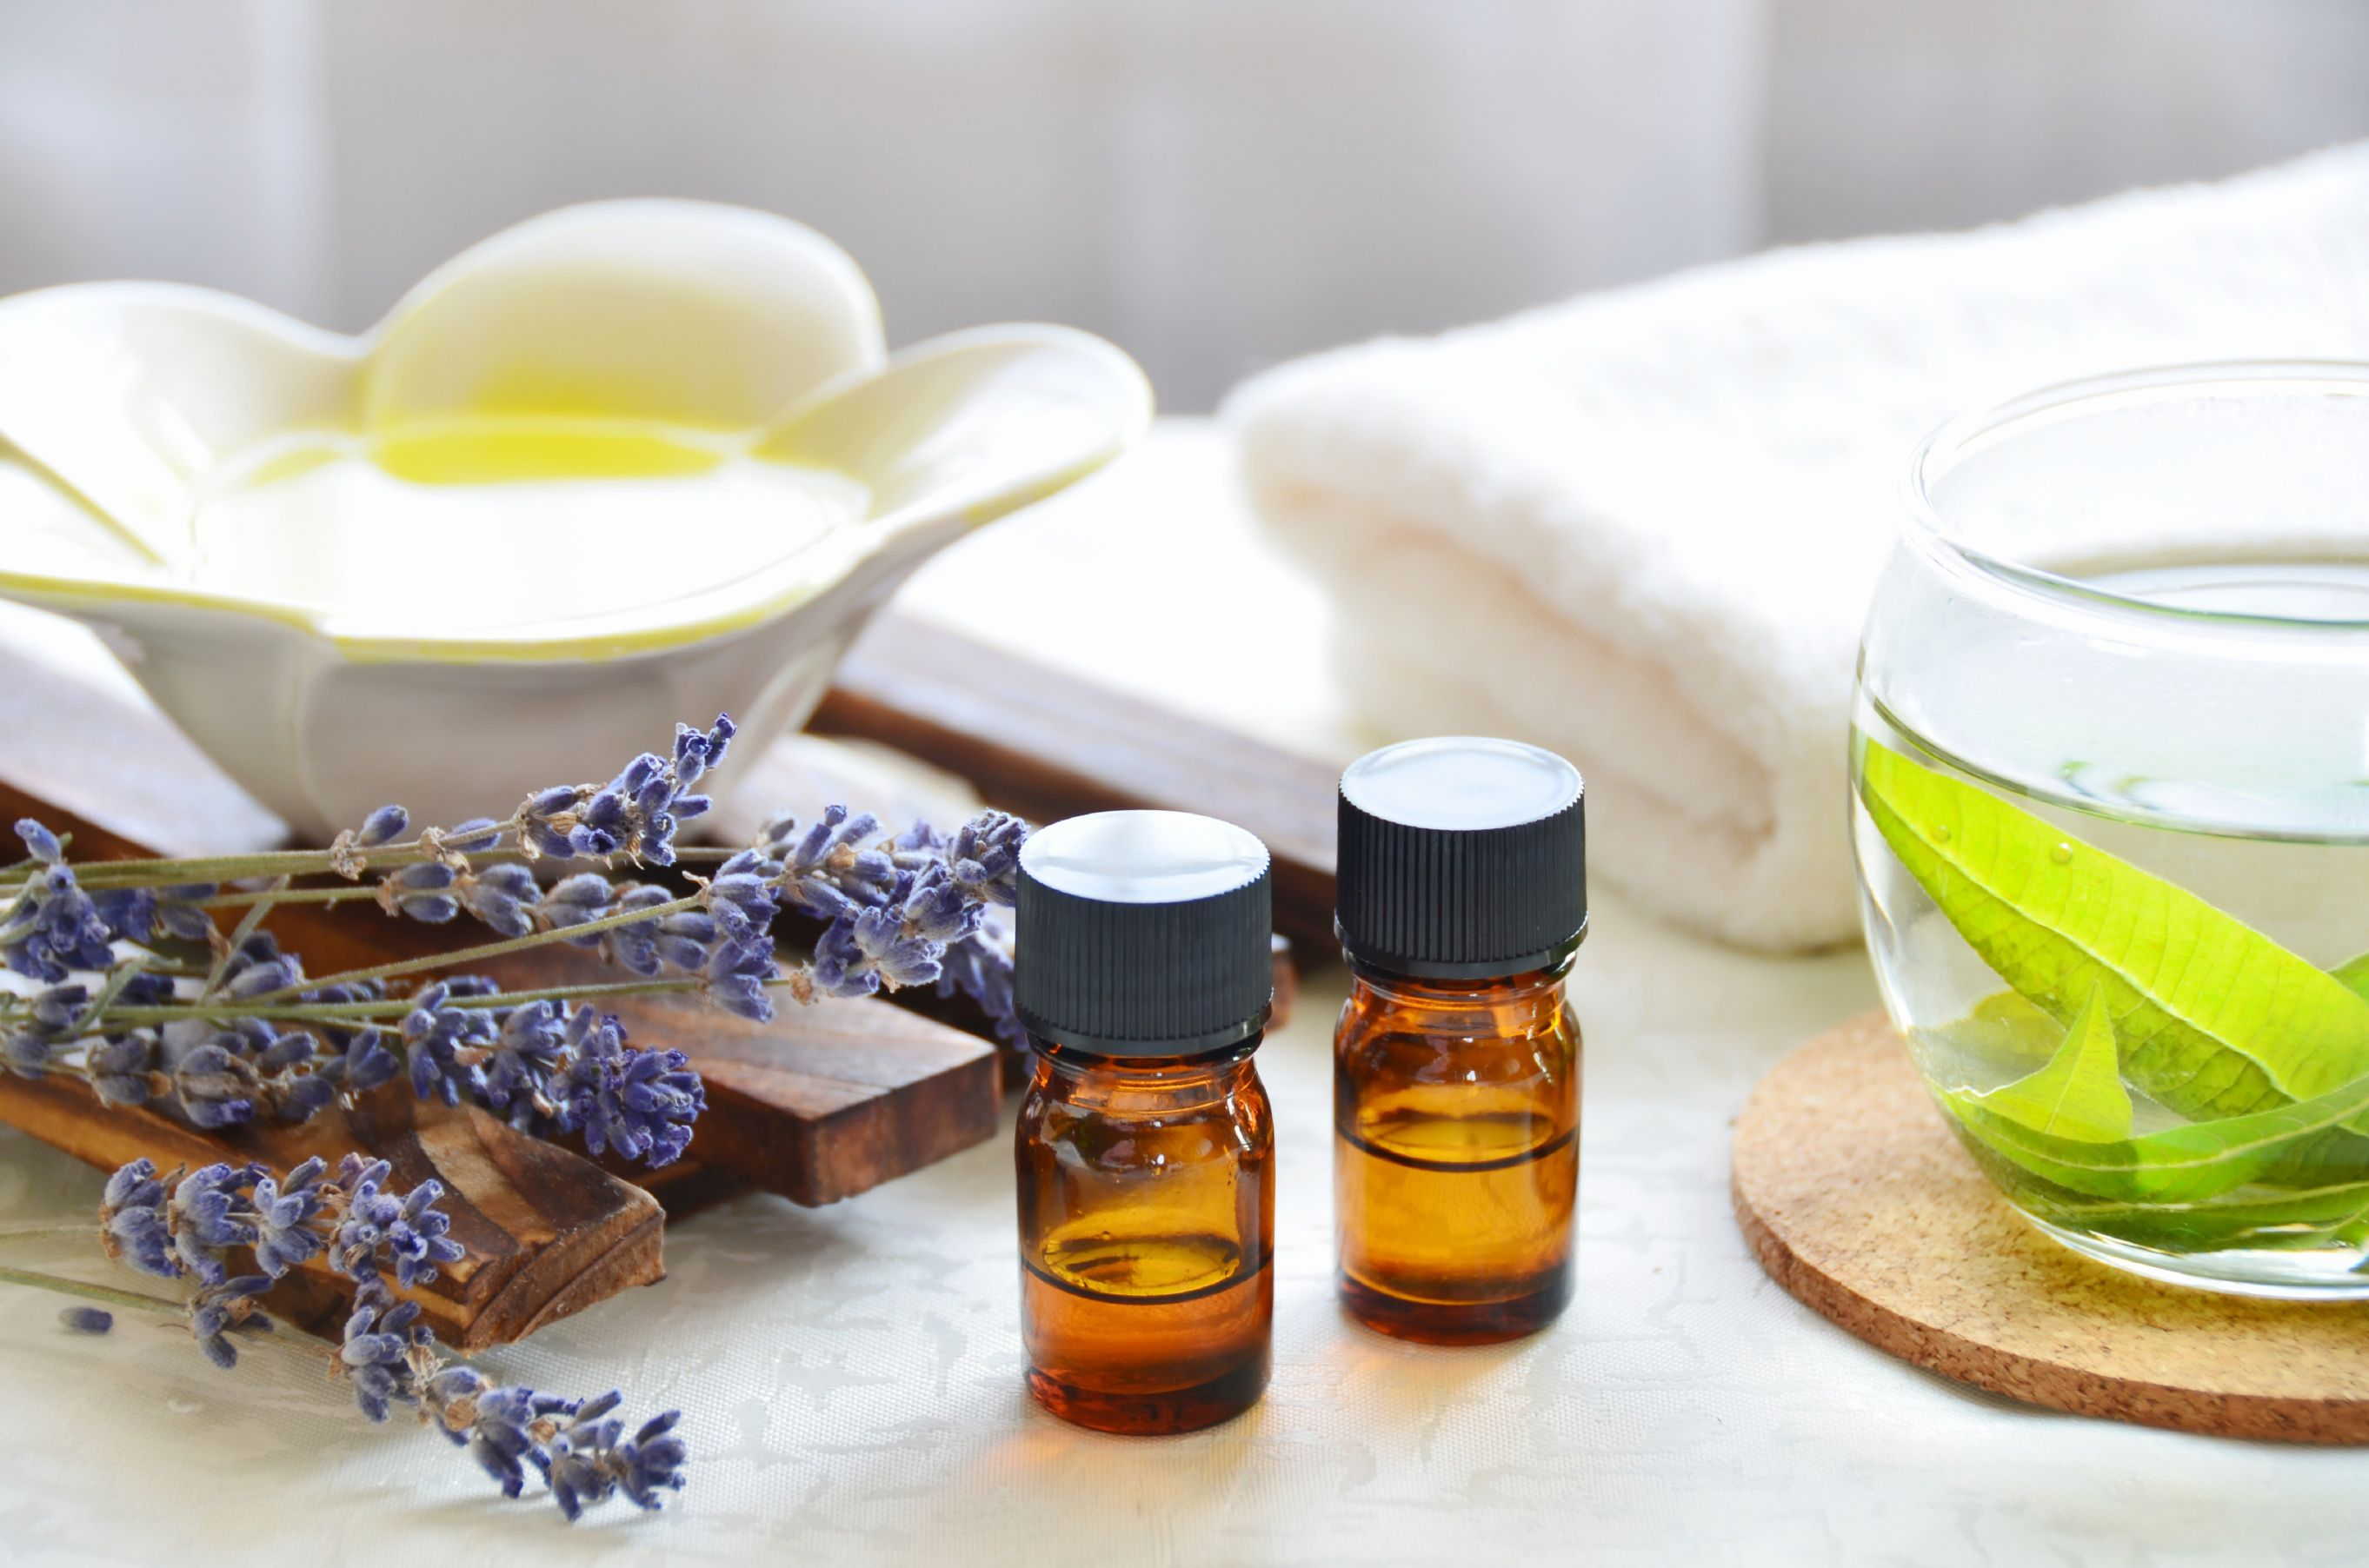 lierre massage supplies aromatherapy